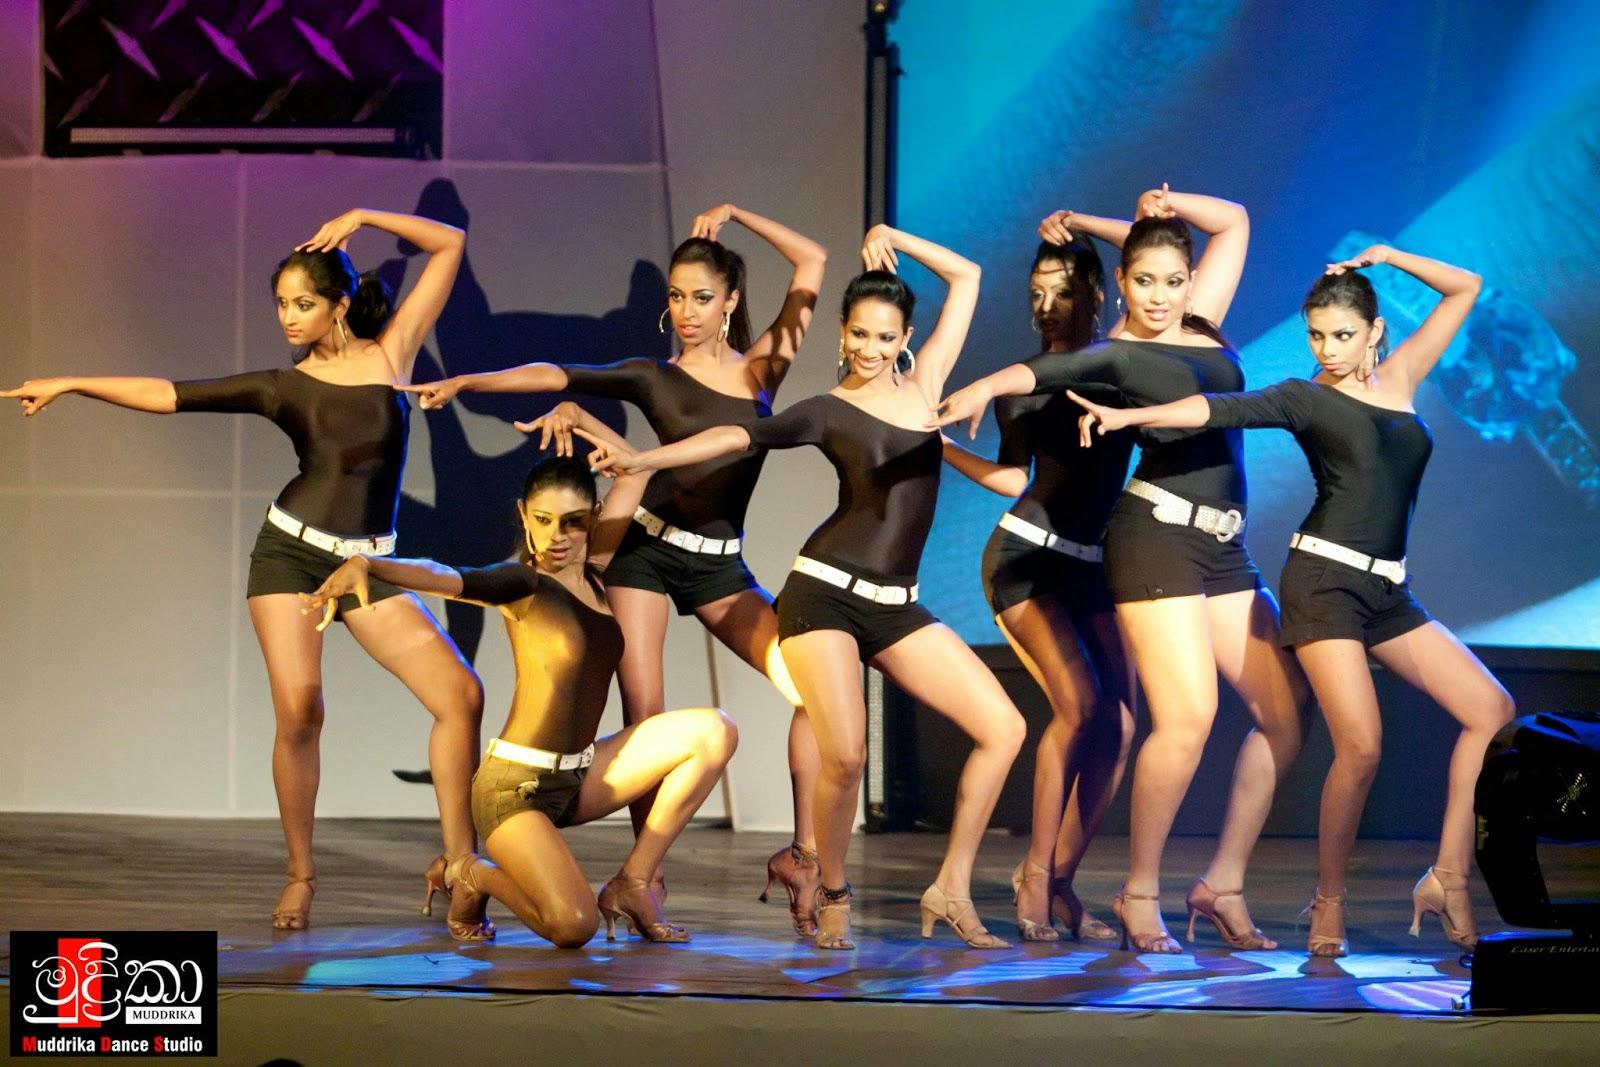 sl dancers in shorts